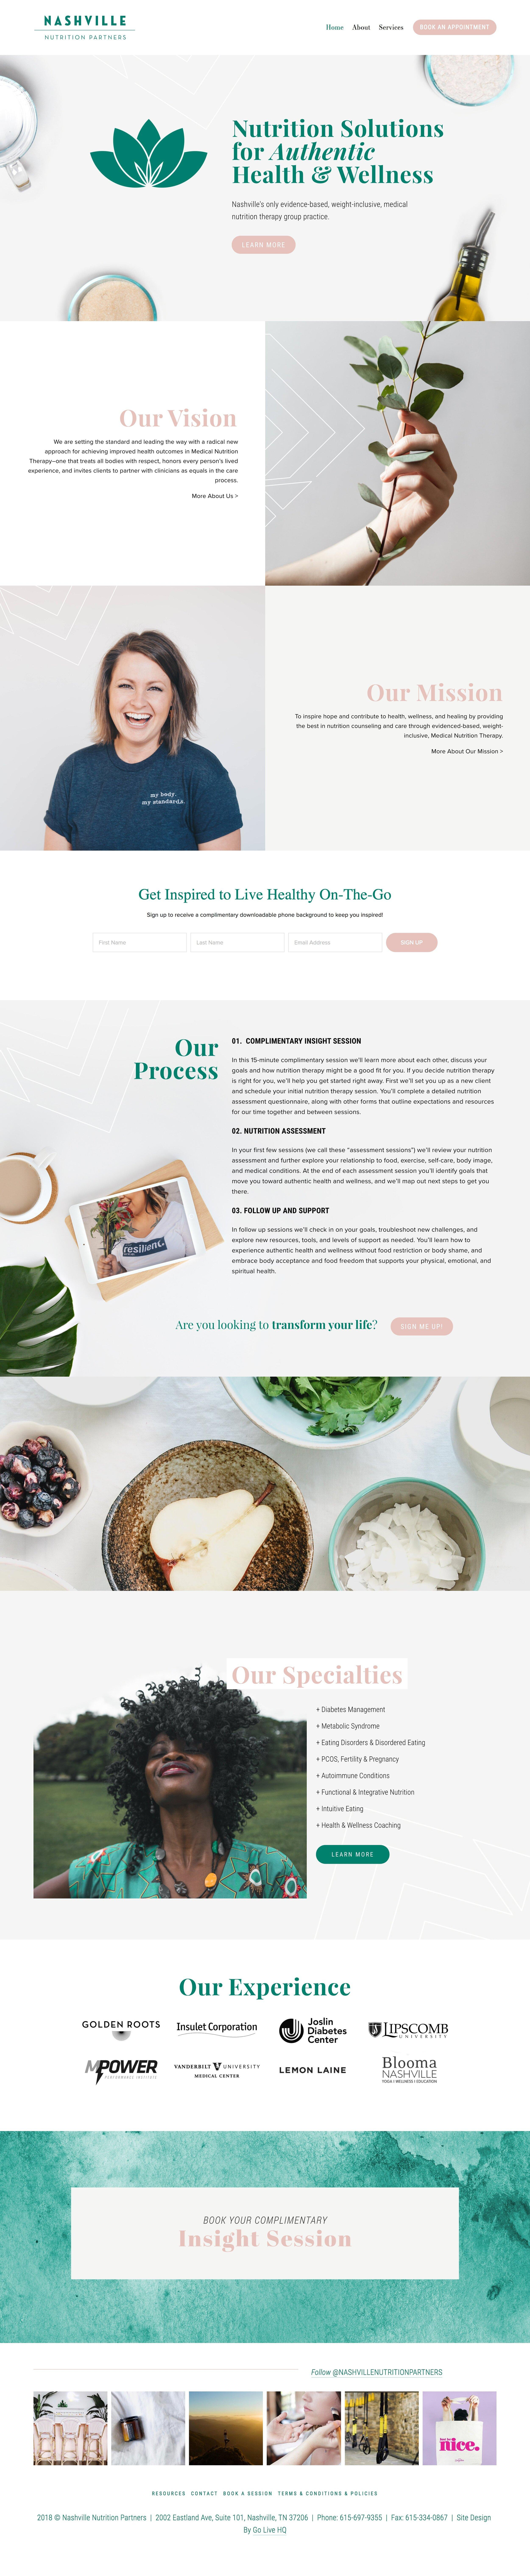 Nashville Nutrition Partners